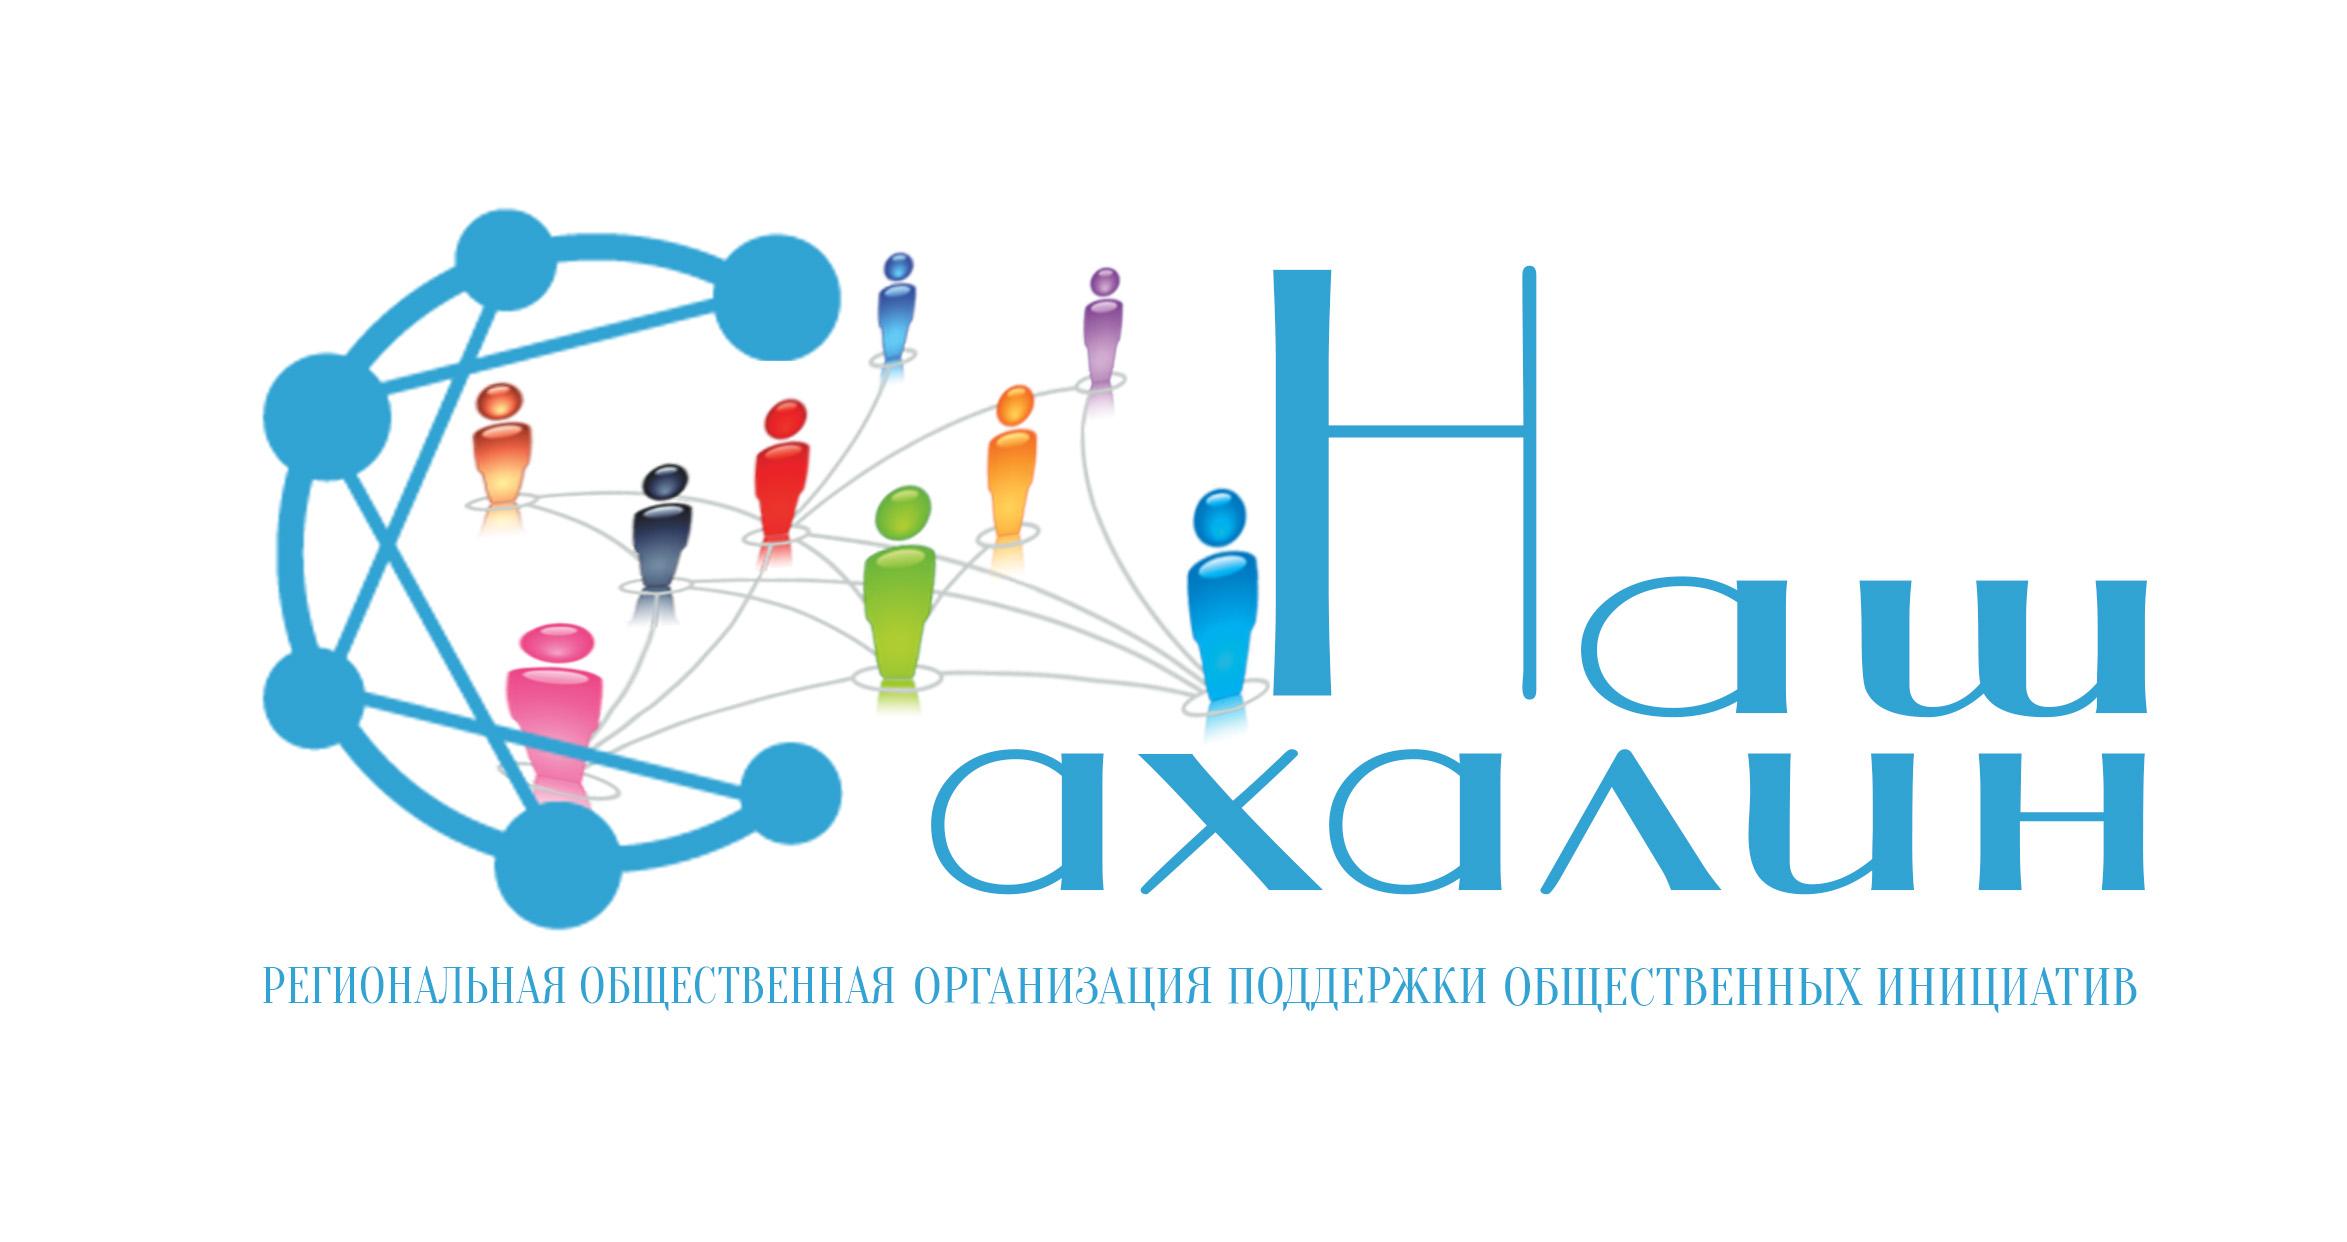 "Логотип для некоммерческой организации ""Наш Сахалин"" фото f_9815a7c7494b1eaa.jpg"